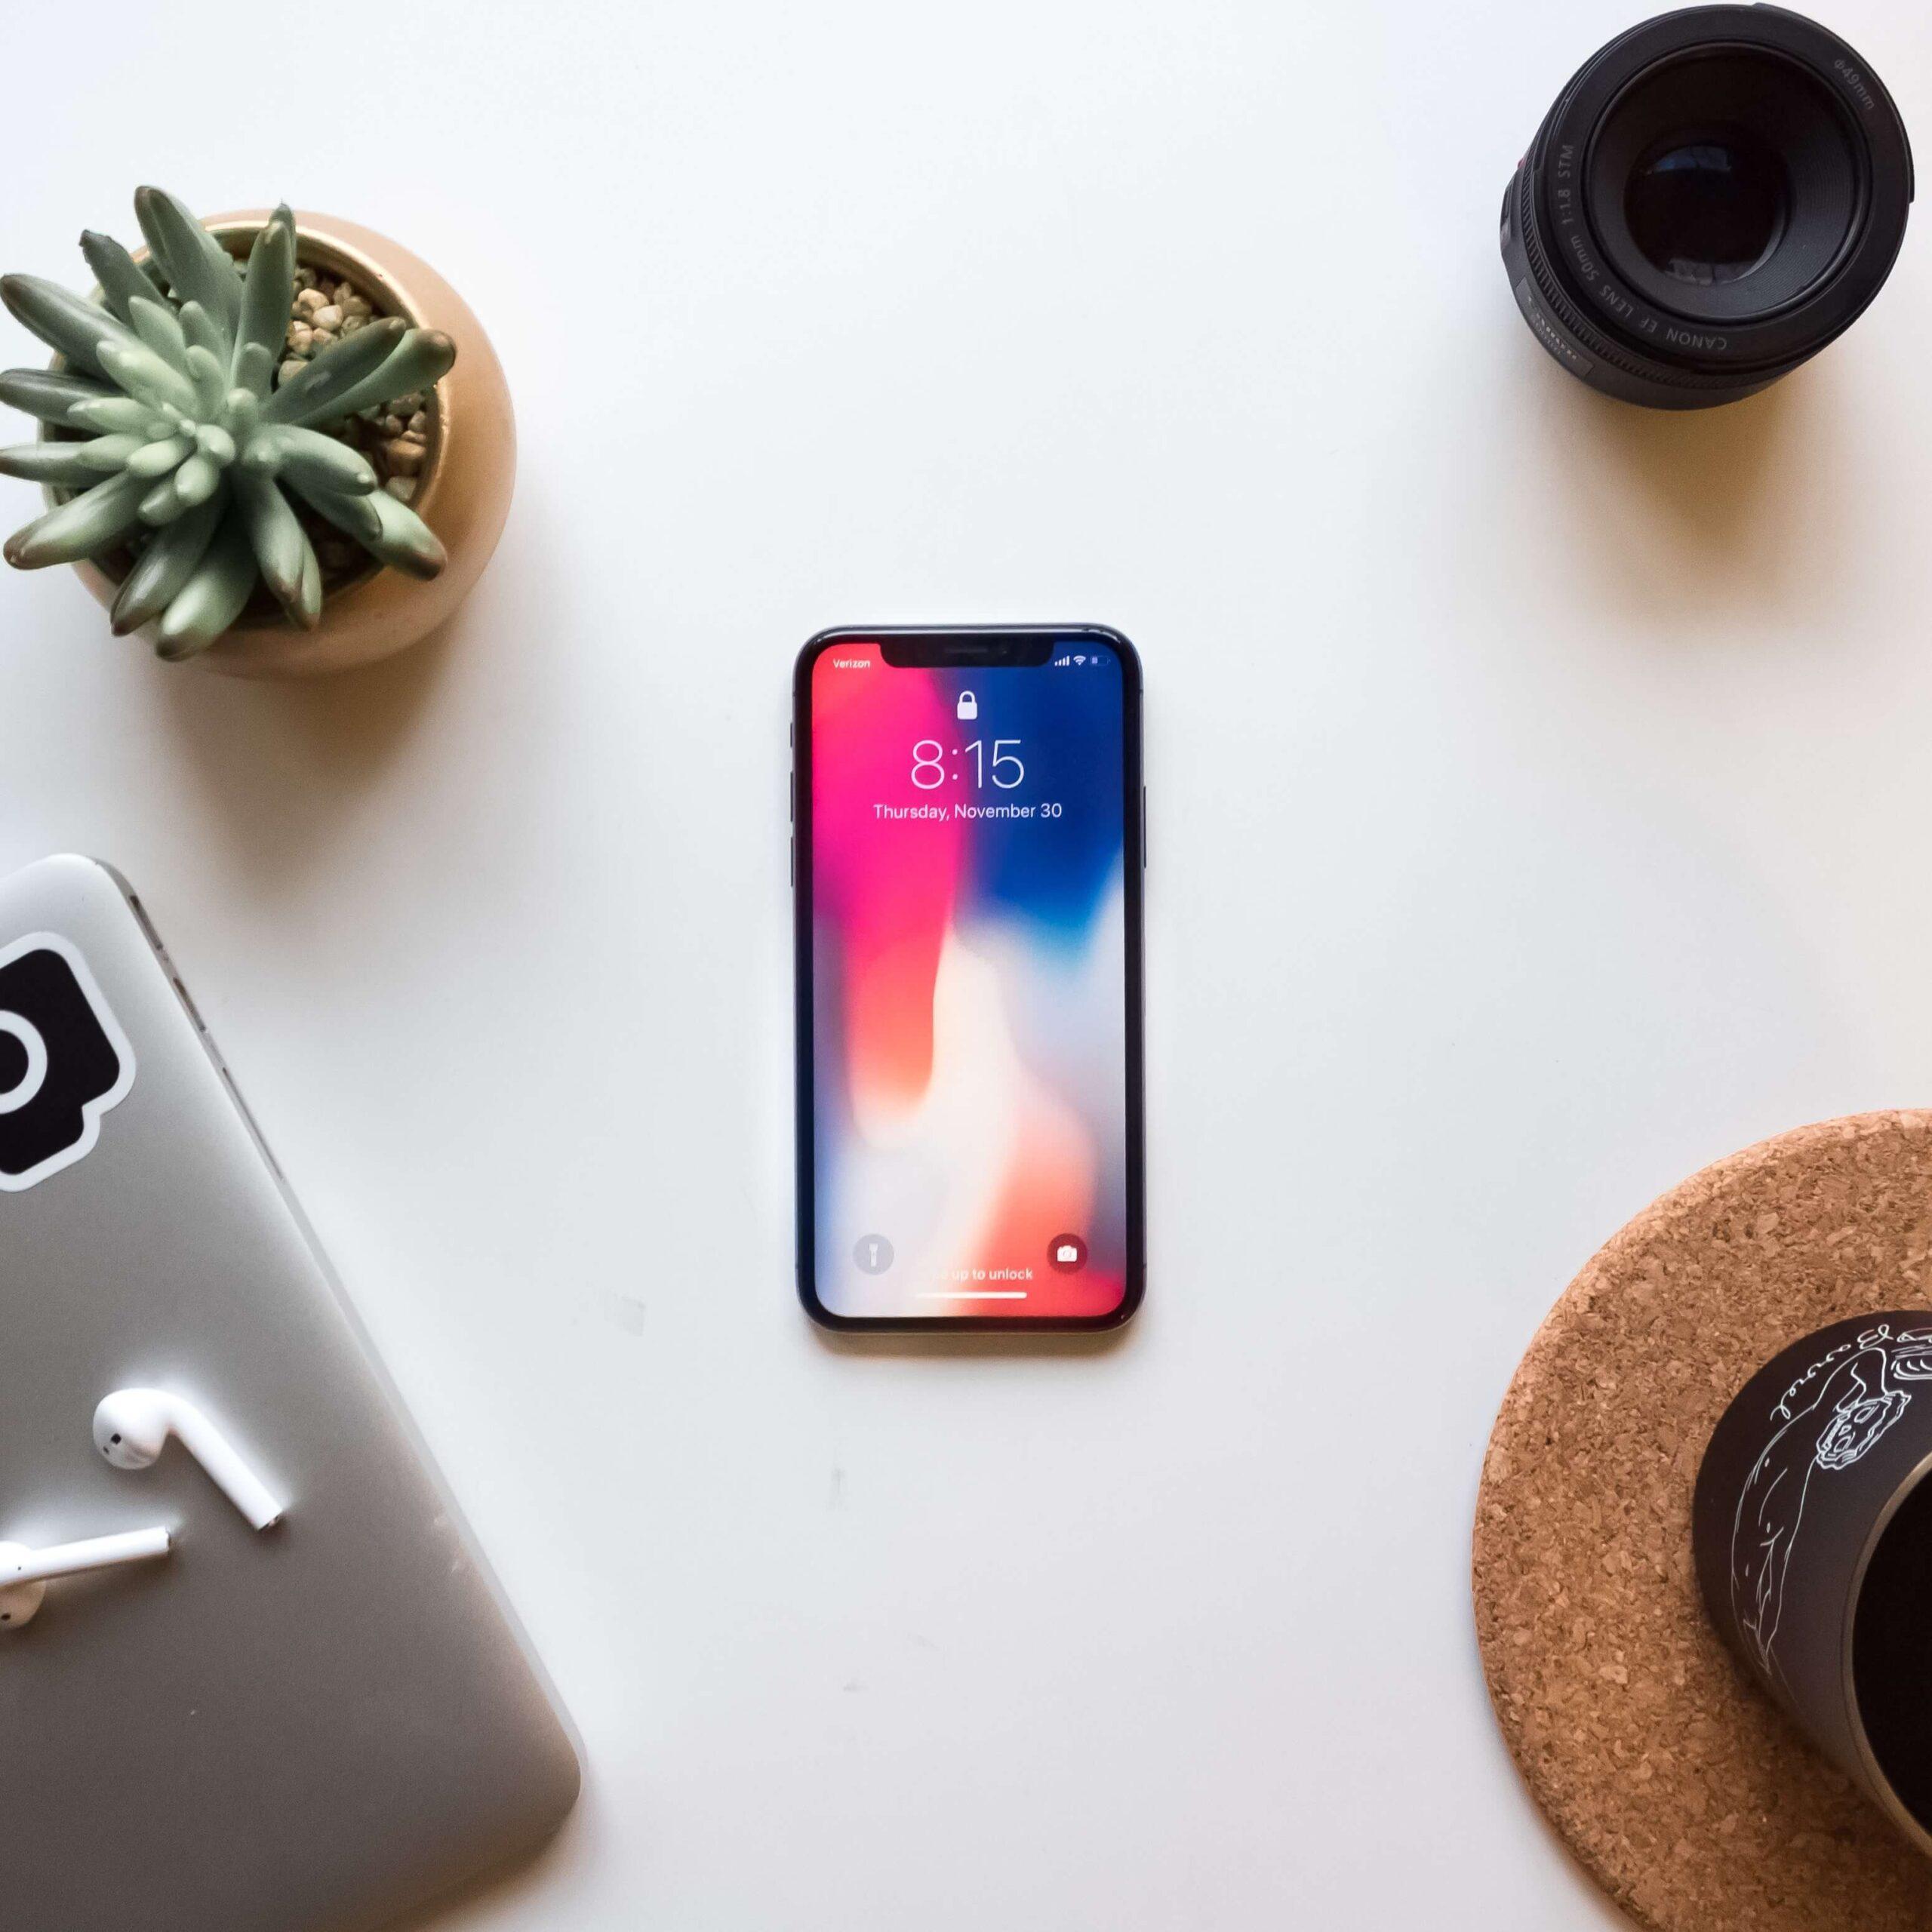 iPhoneで作る、iPhone用無料オリジナル着信音